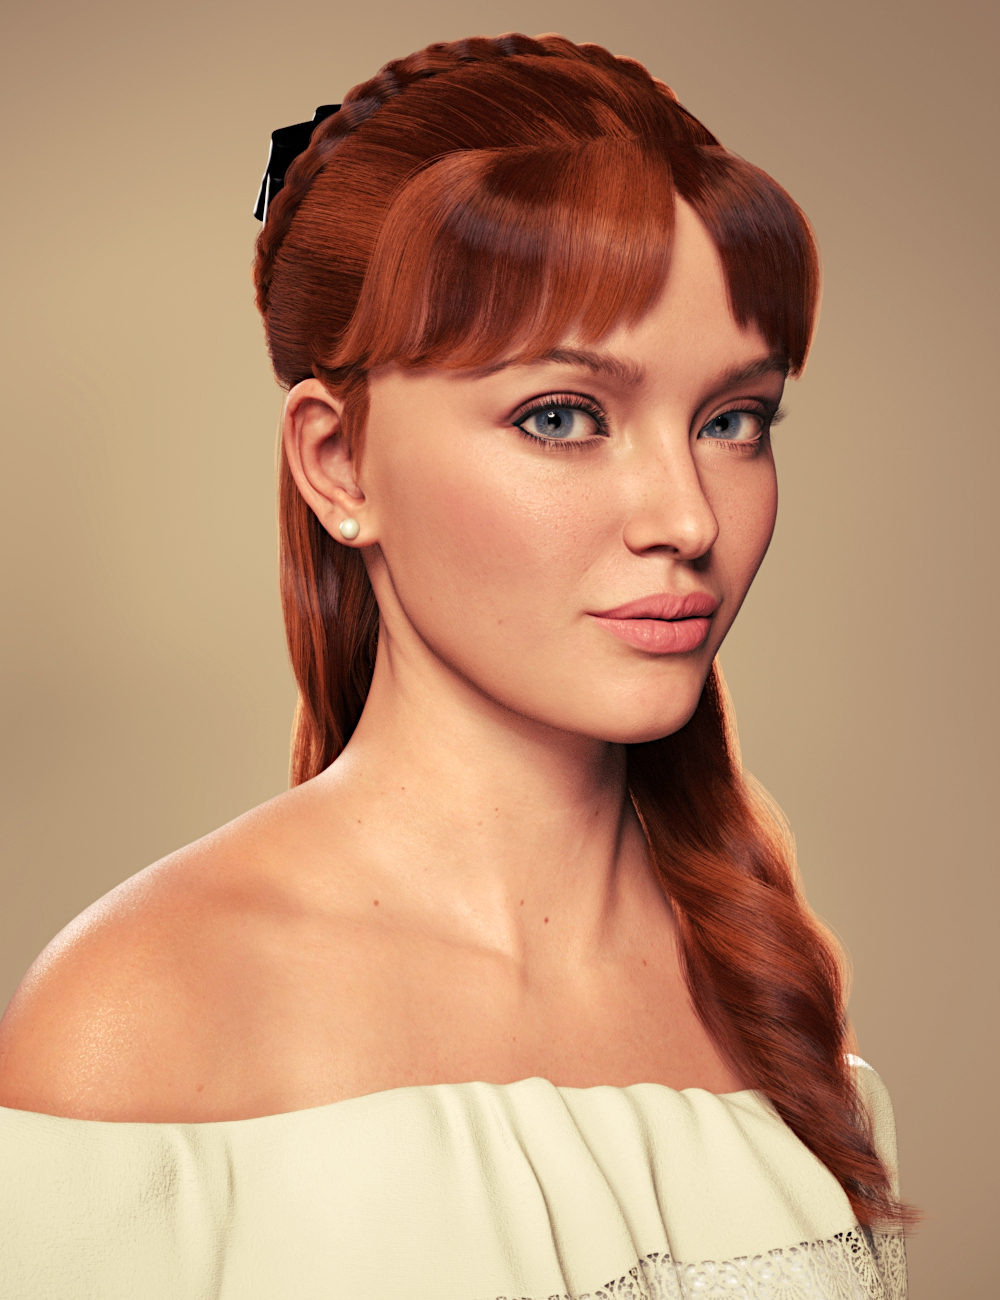 Debutante Hair for Genesis 8 and 8.1 Female by: Toyen, 3D Models by Daz 3D